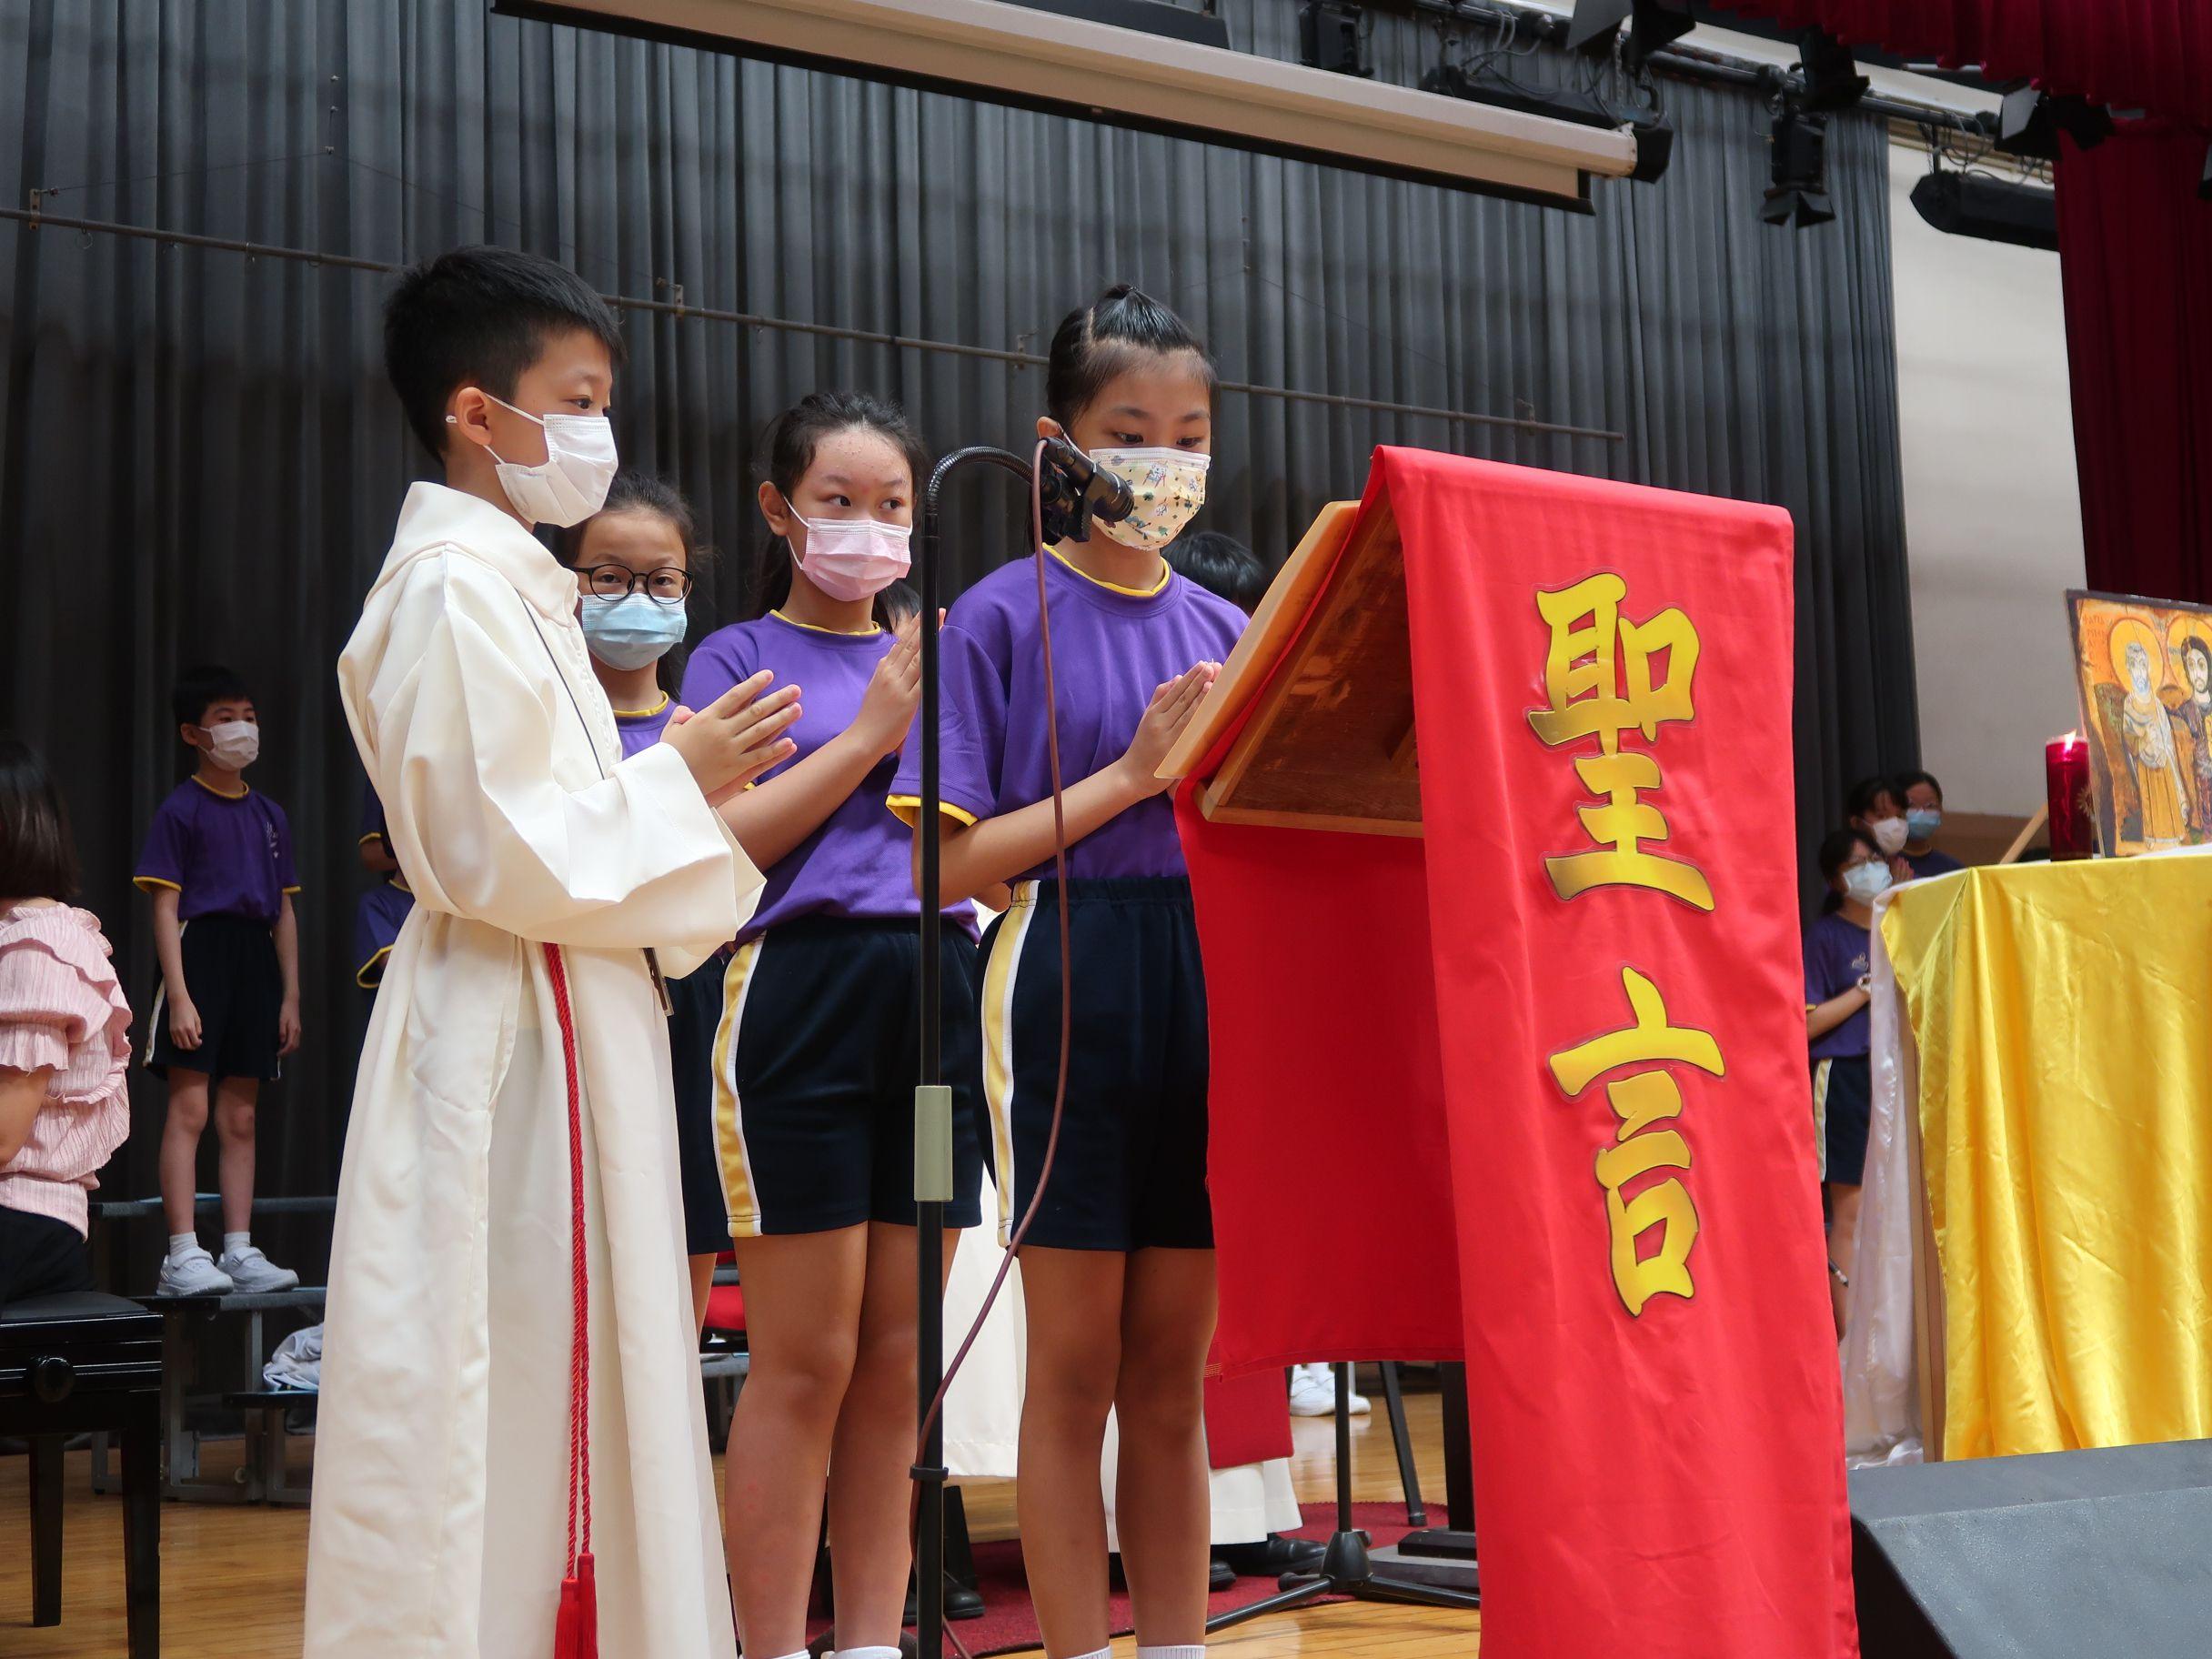 https://syh.edu.hk/sites/default/files/img_7635.jpg